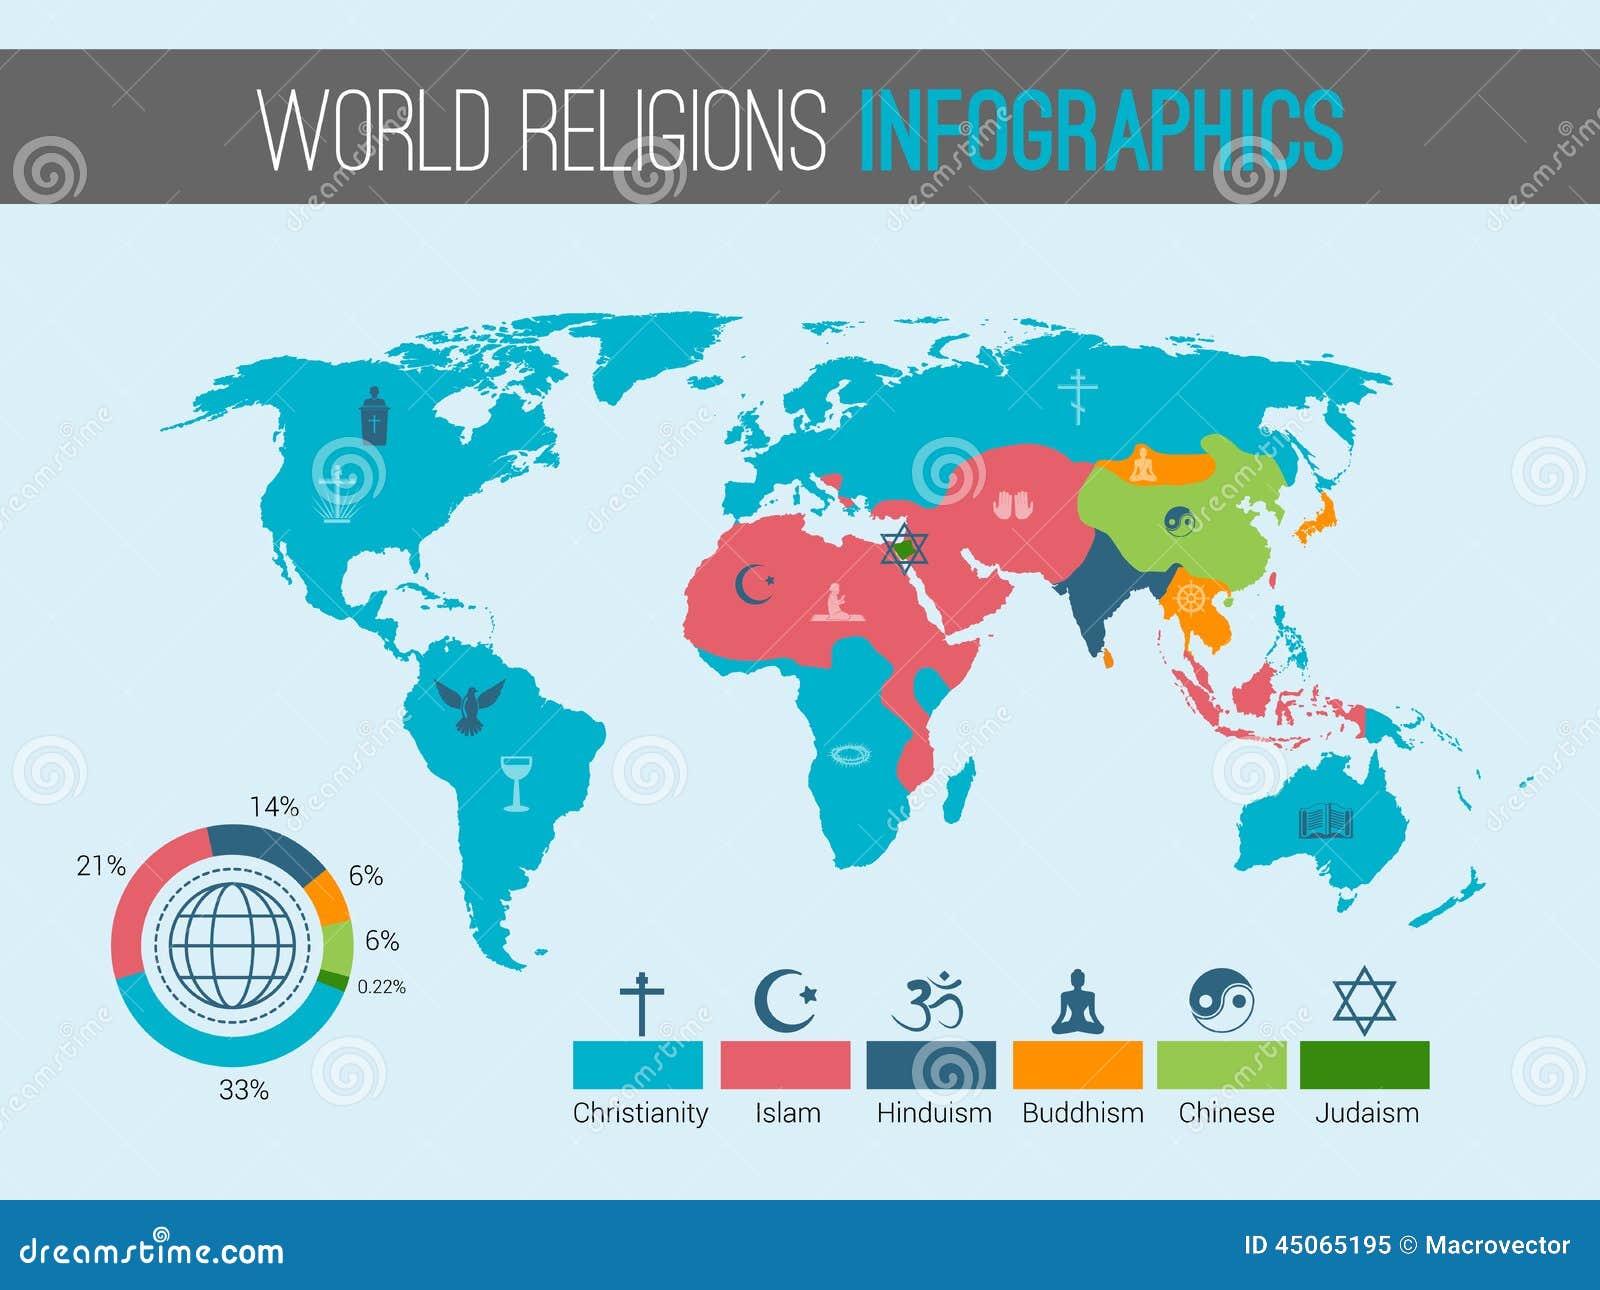 World Religions Chart BlackDemographicscom Black - Religion map of the world 2013